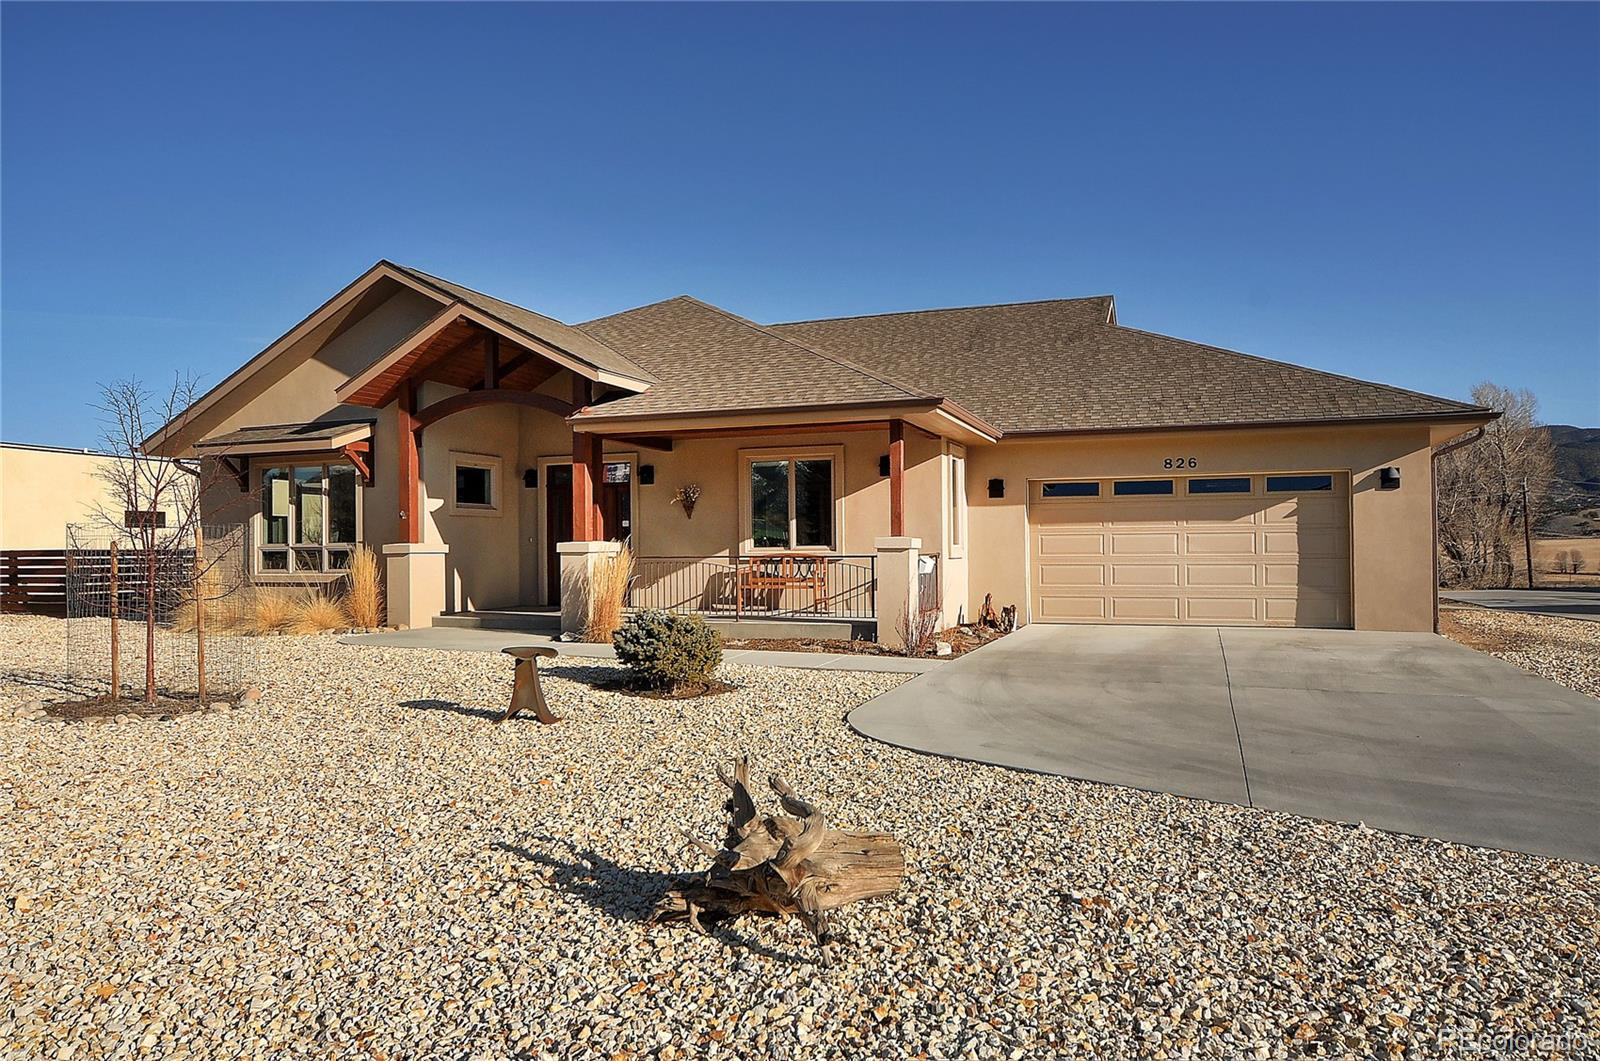 826 Crestone Avenue, Salida, CO 81201 - Salida, CO real estate listing